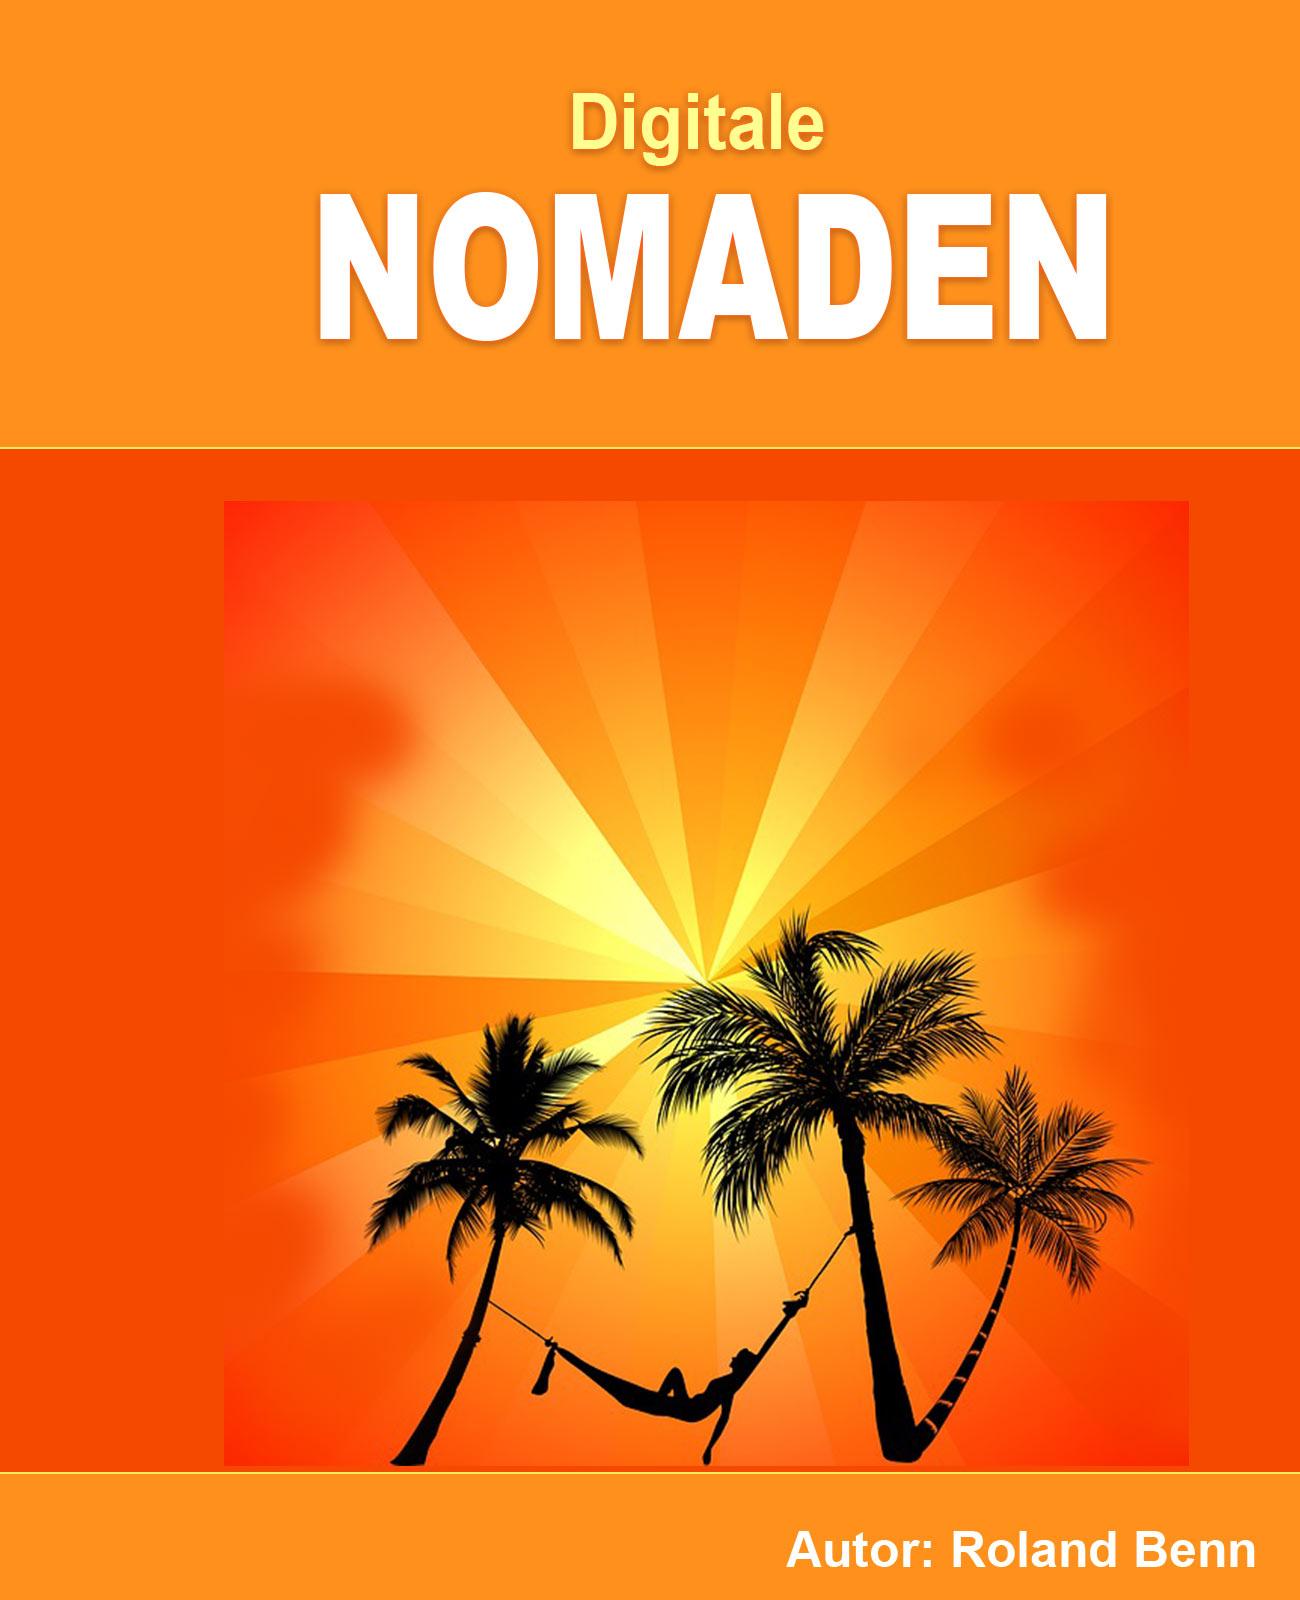 Digitale Nomaden